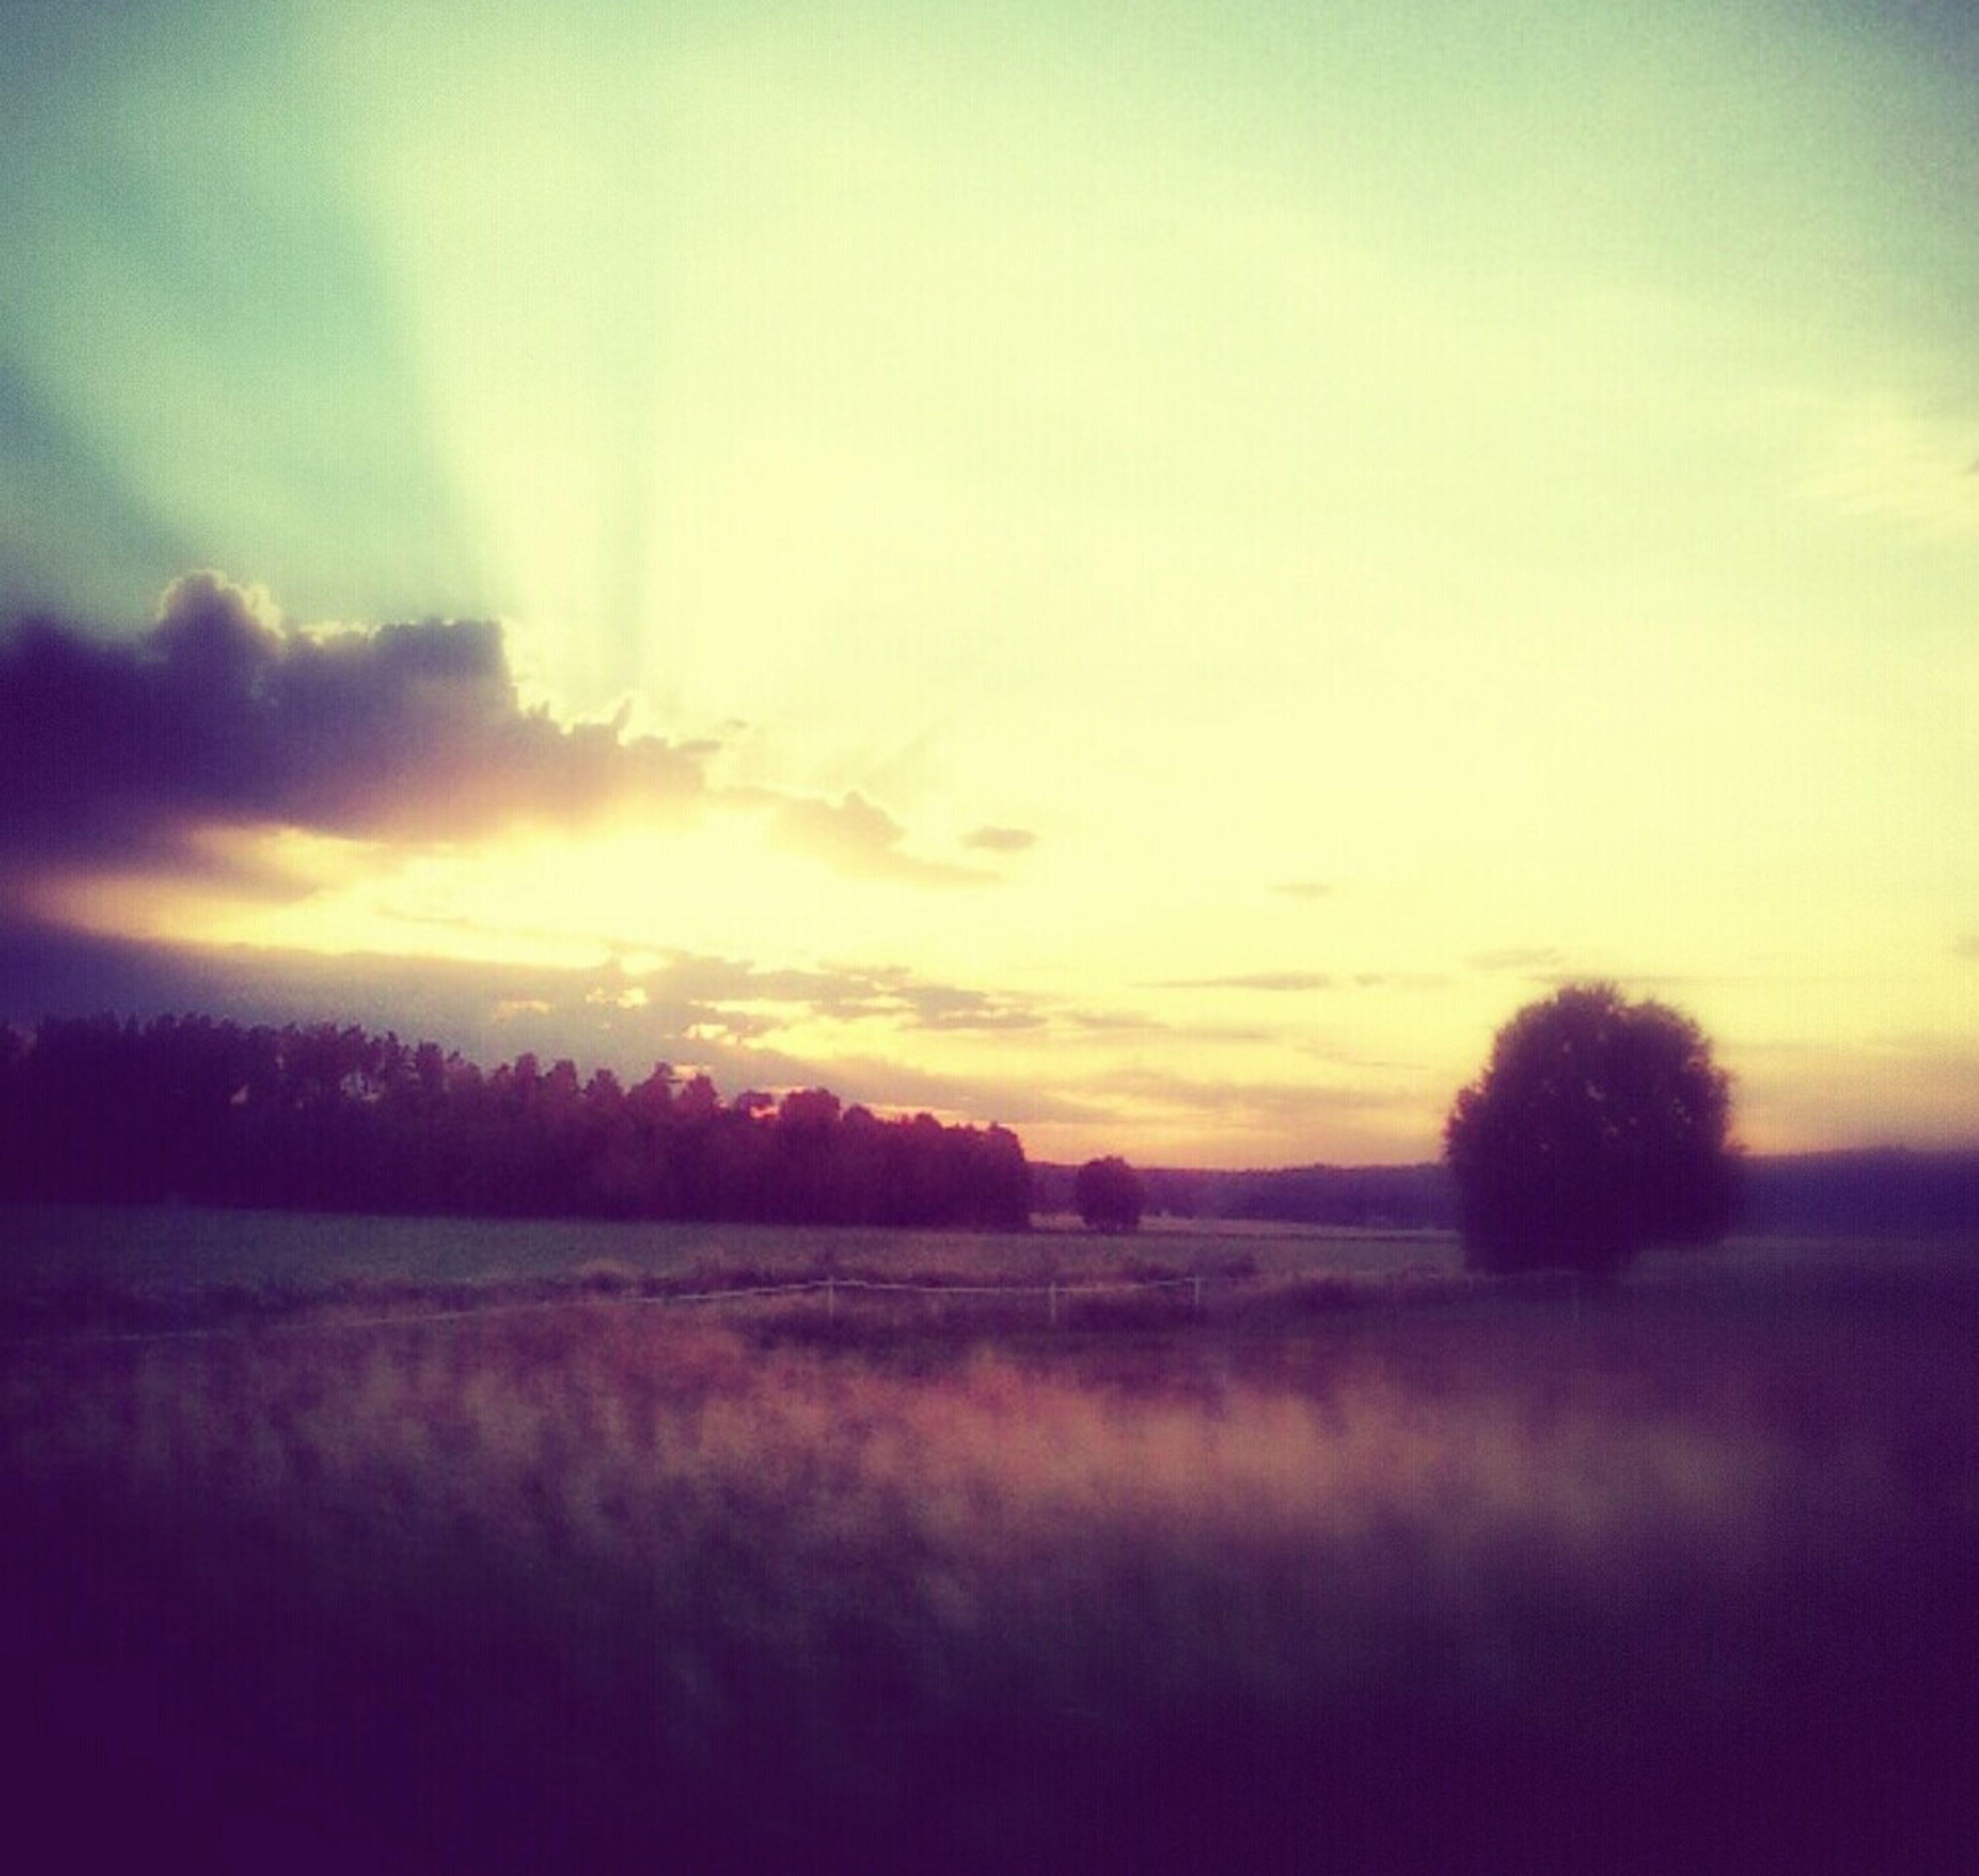 sunset, tranquil scene, tranquility, landscape, scenics, beauty in nature, field, sky, tree, nature, silhouette, idyllic, rural scene, orange color, non-urban scene, cloud - sky, outdoors, horizon over land, dusk, no people